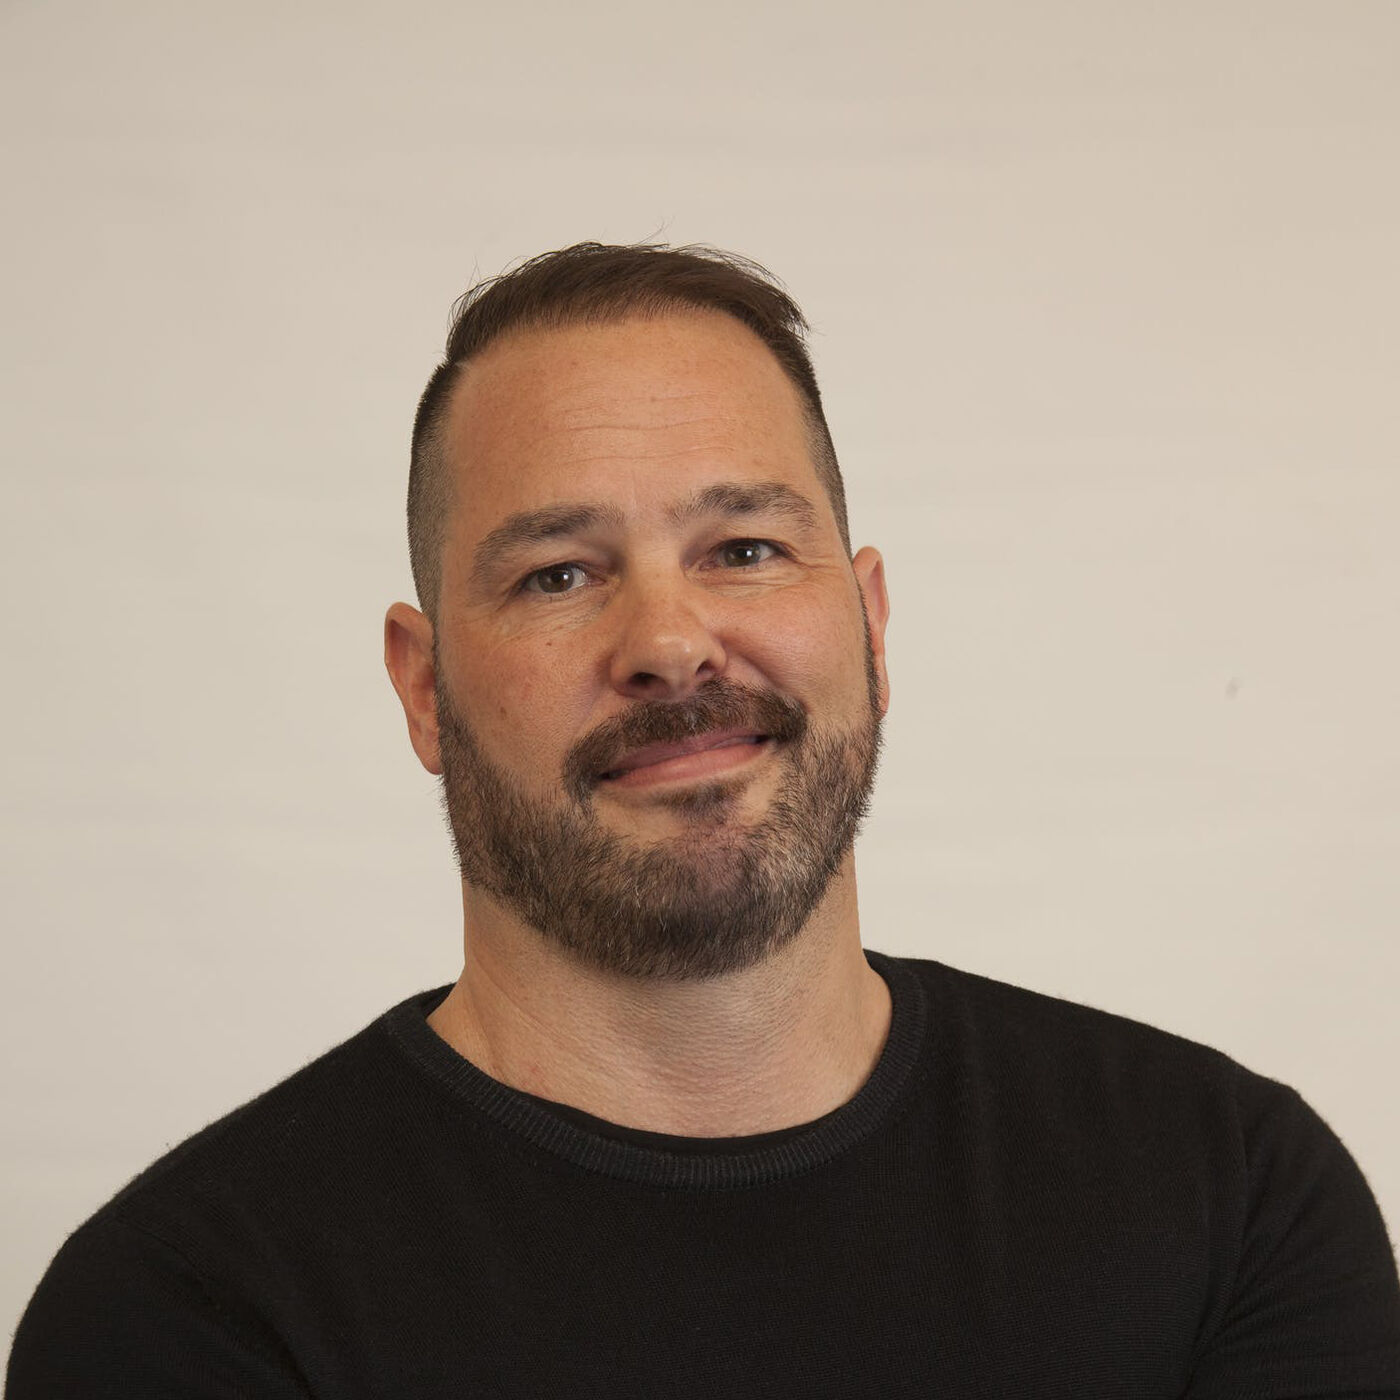 Dr Steve Yacovelli